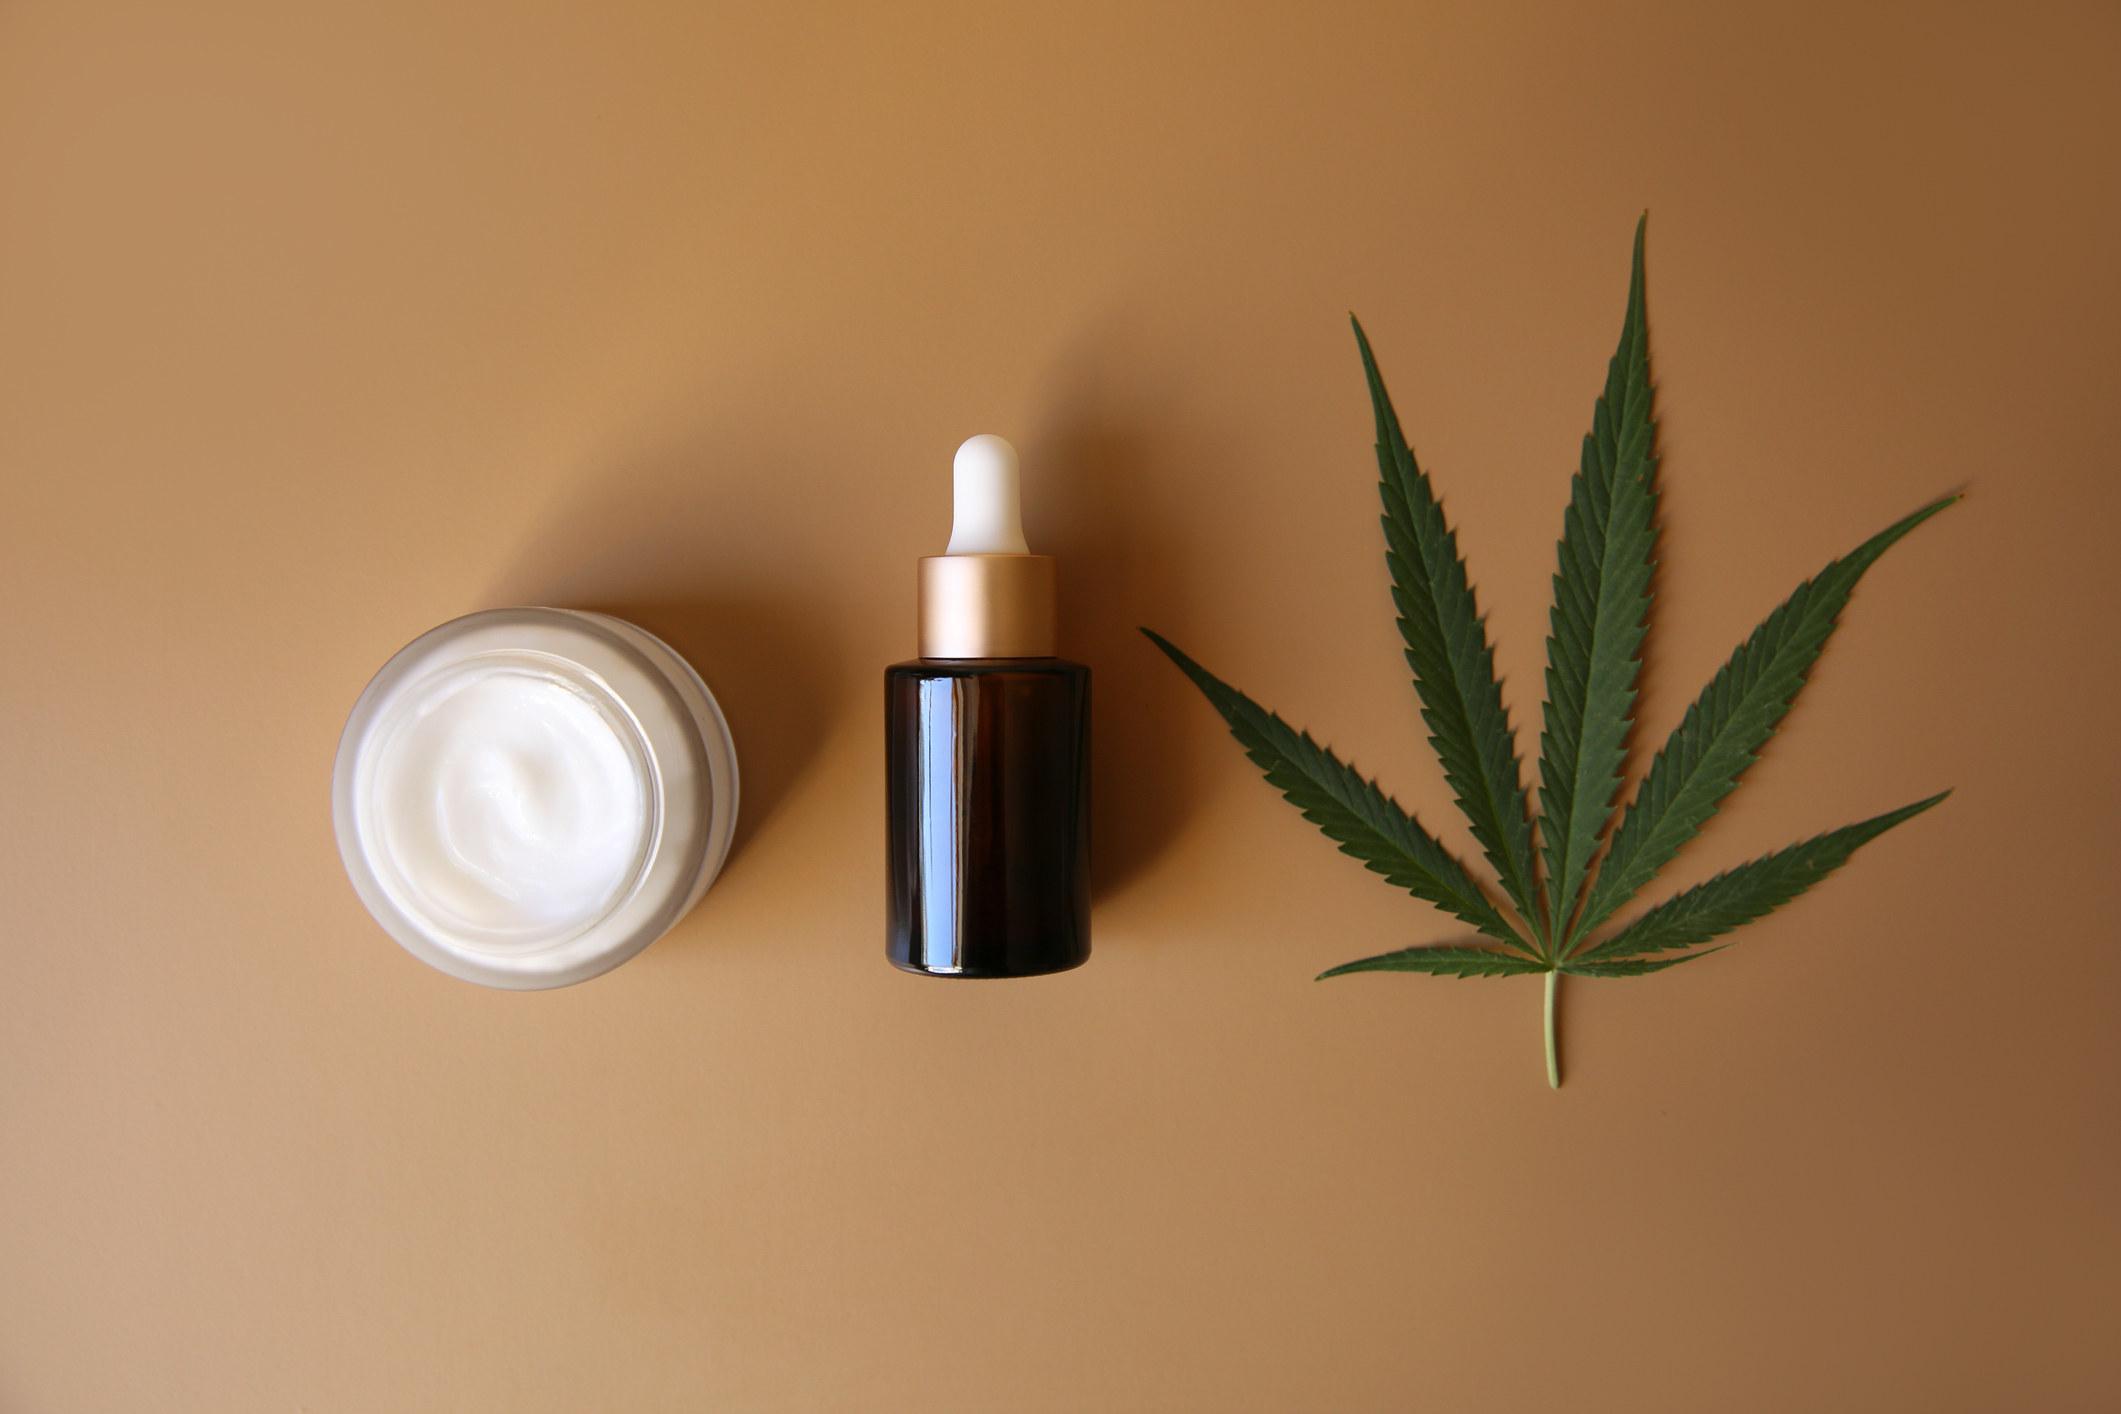 CBD lotion, oil, and a hemp leaf